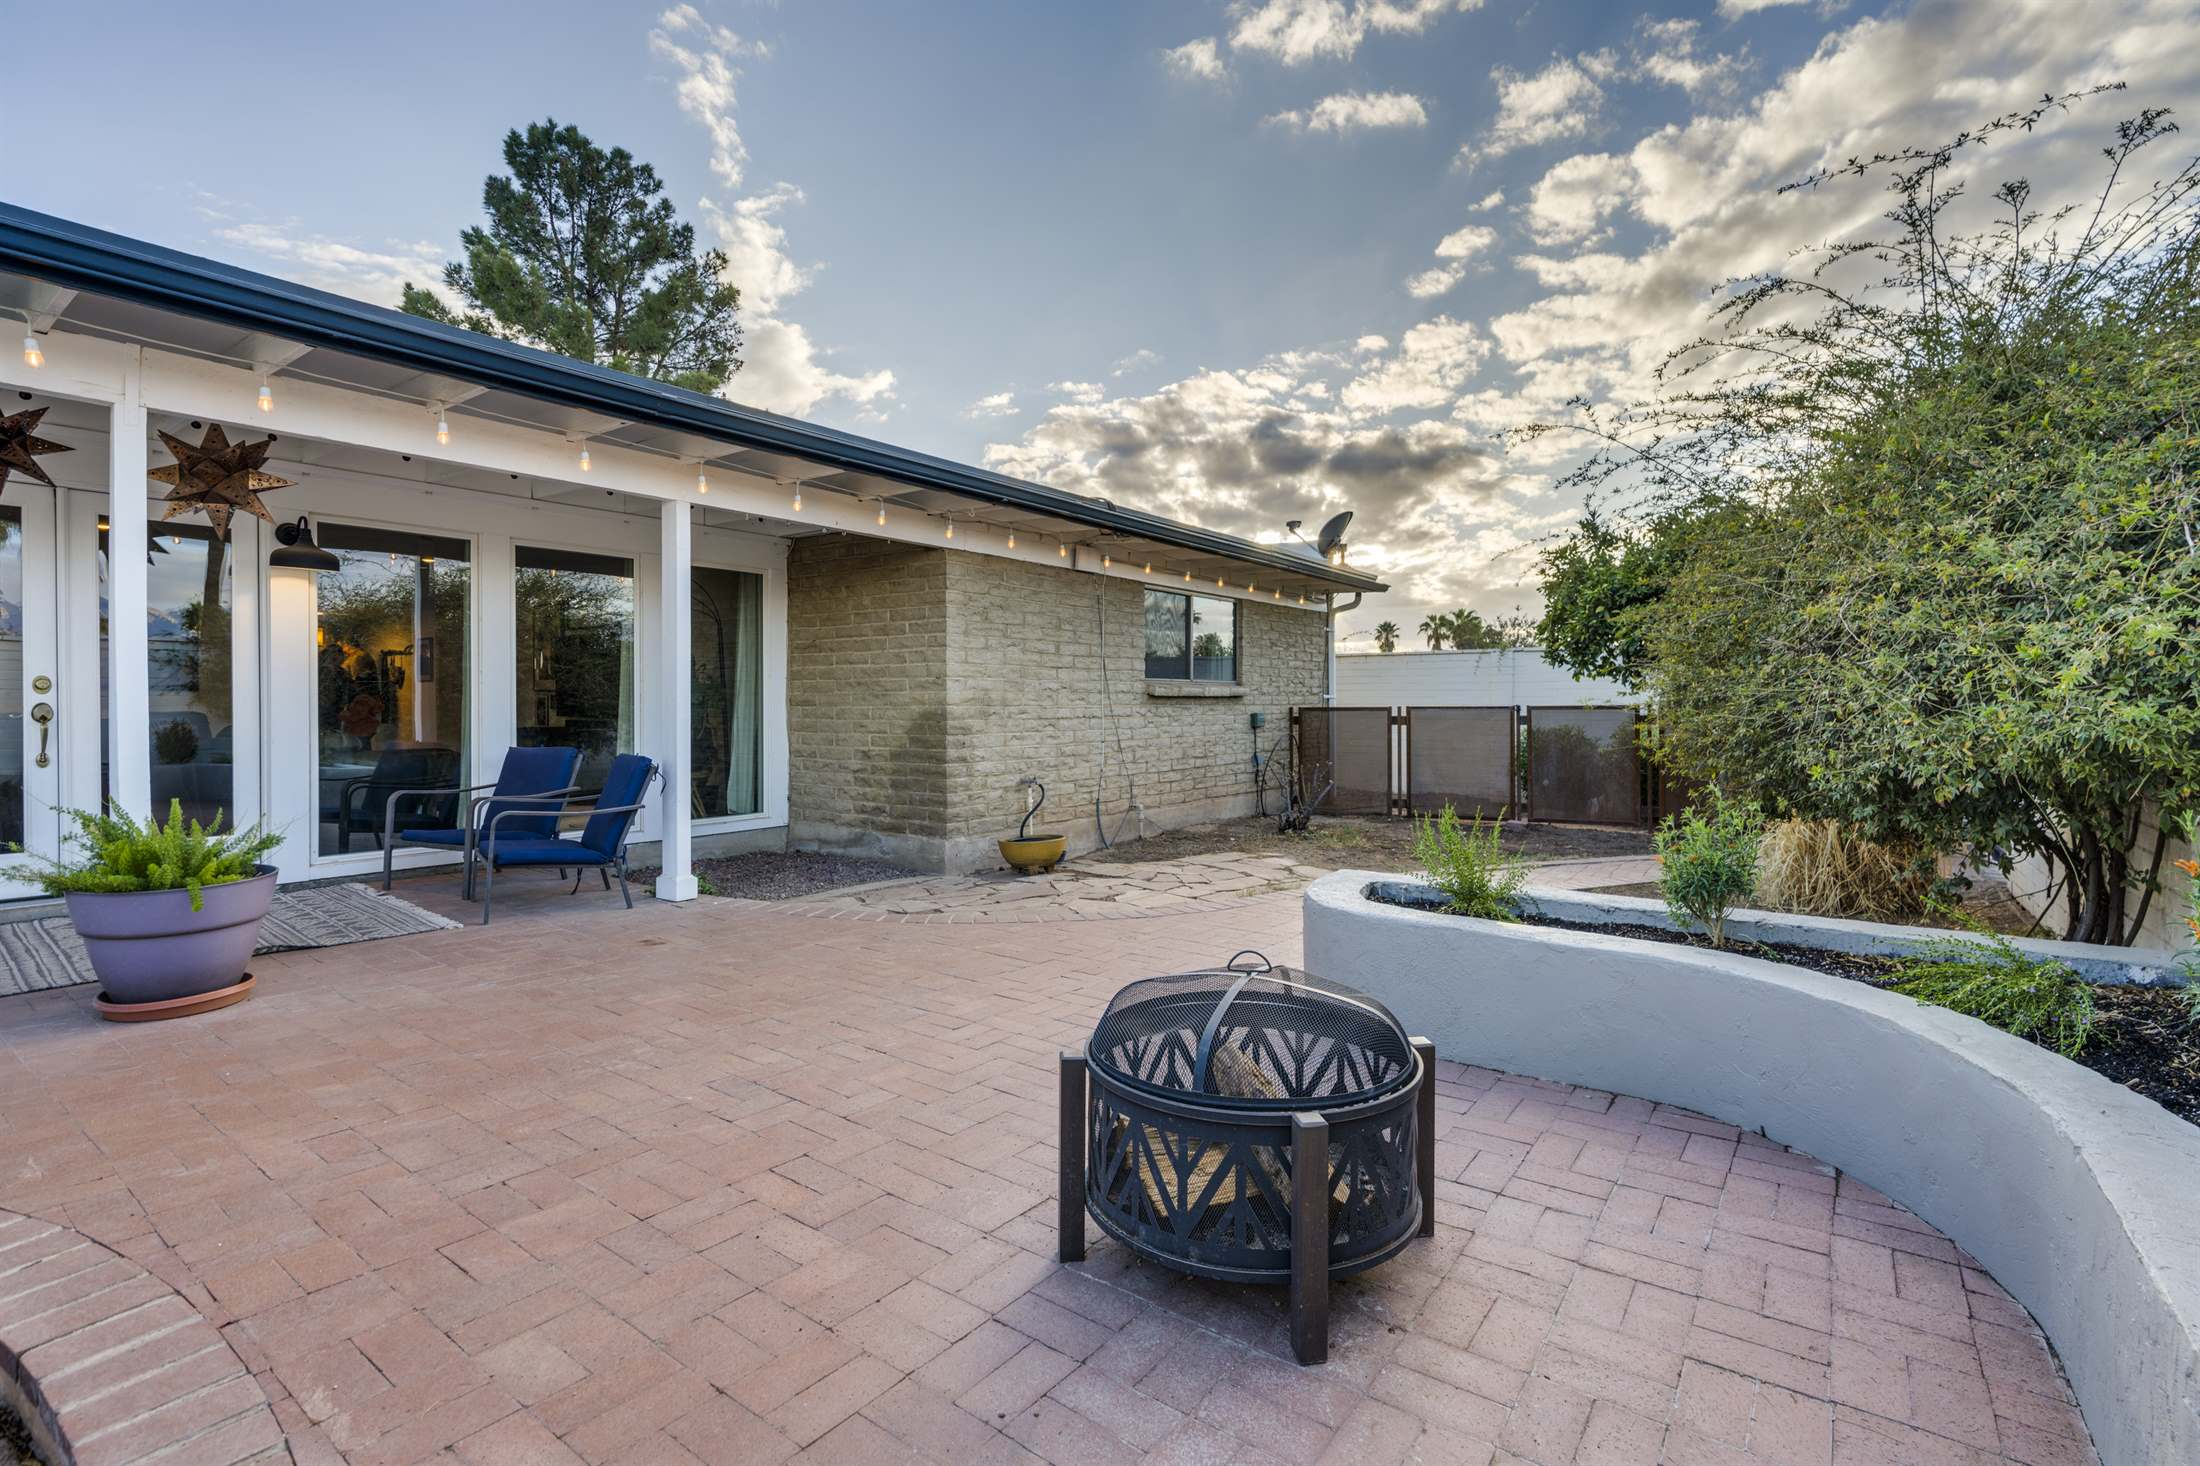 9221 E Chirco Place, Tucson, AZ 85710